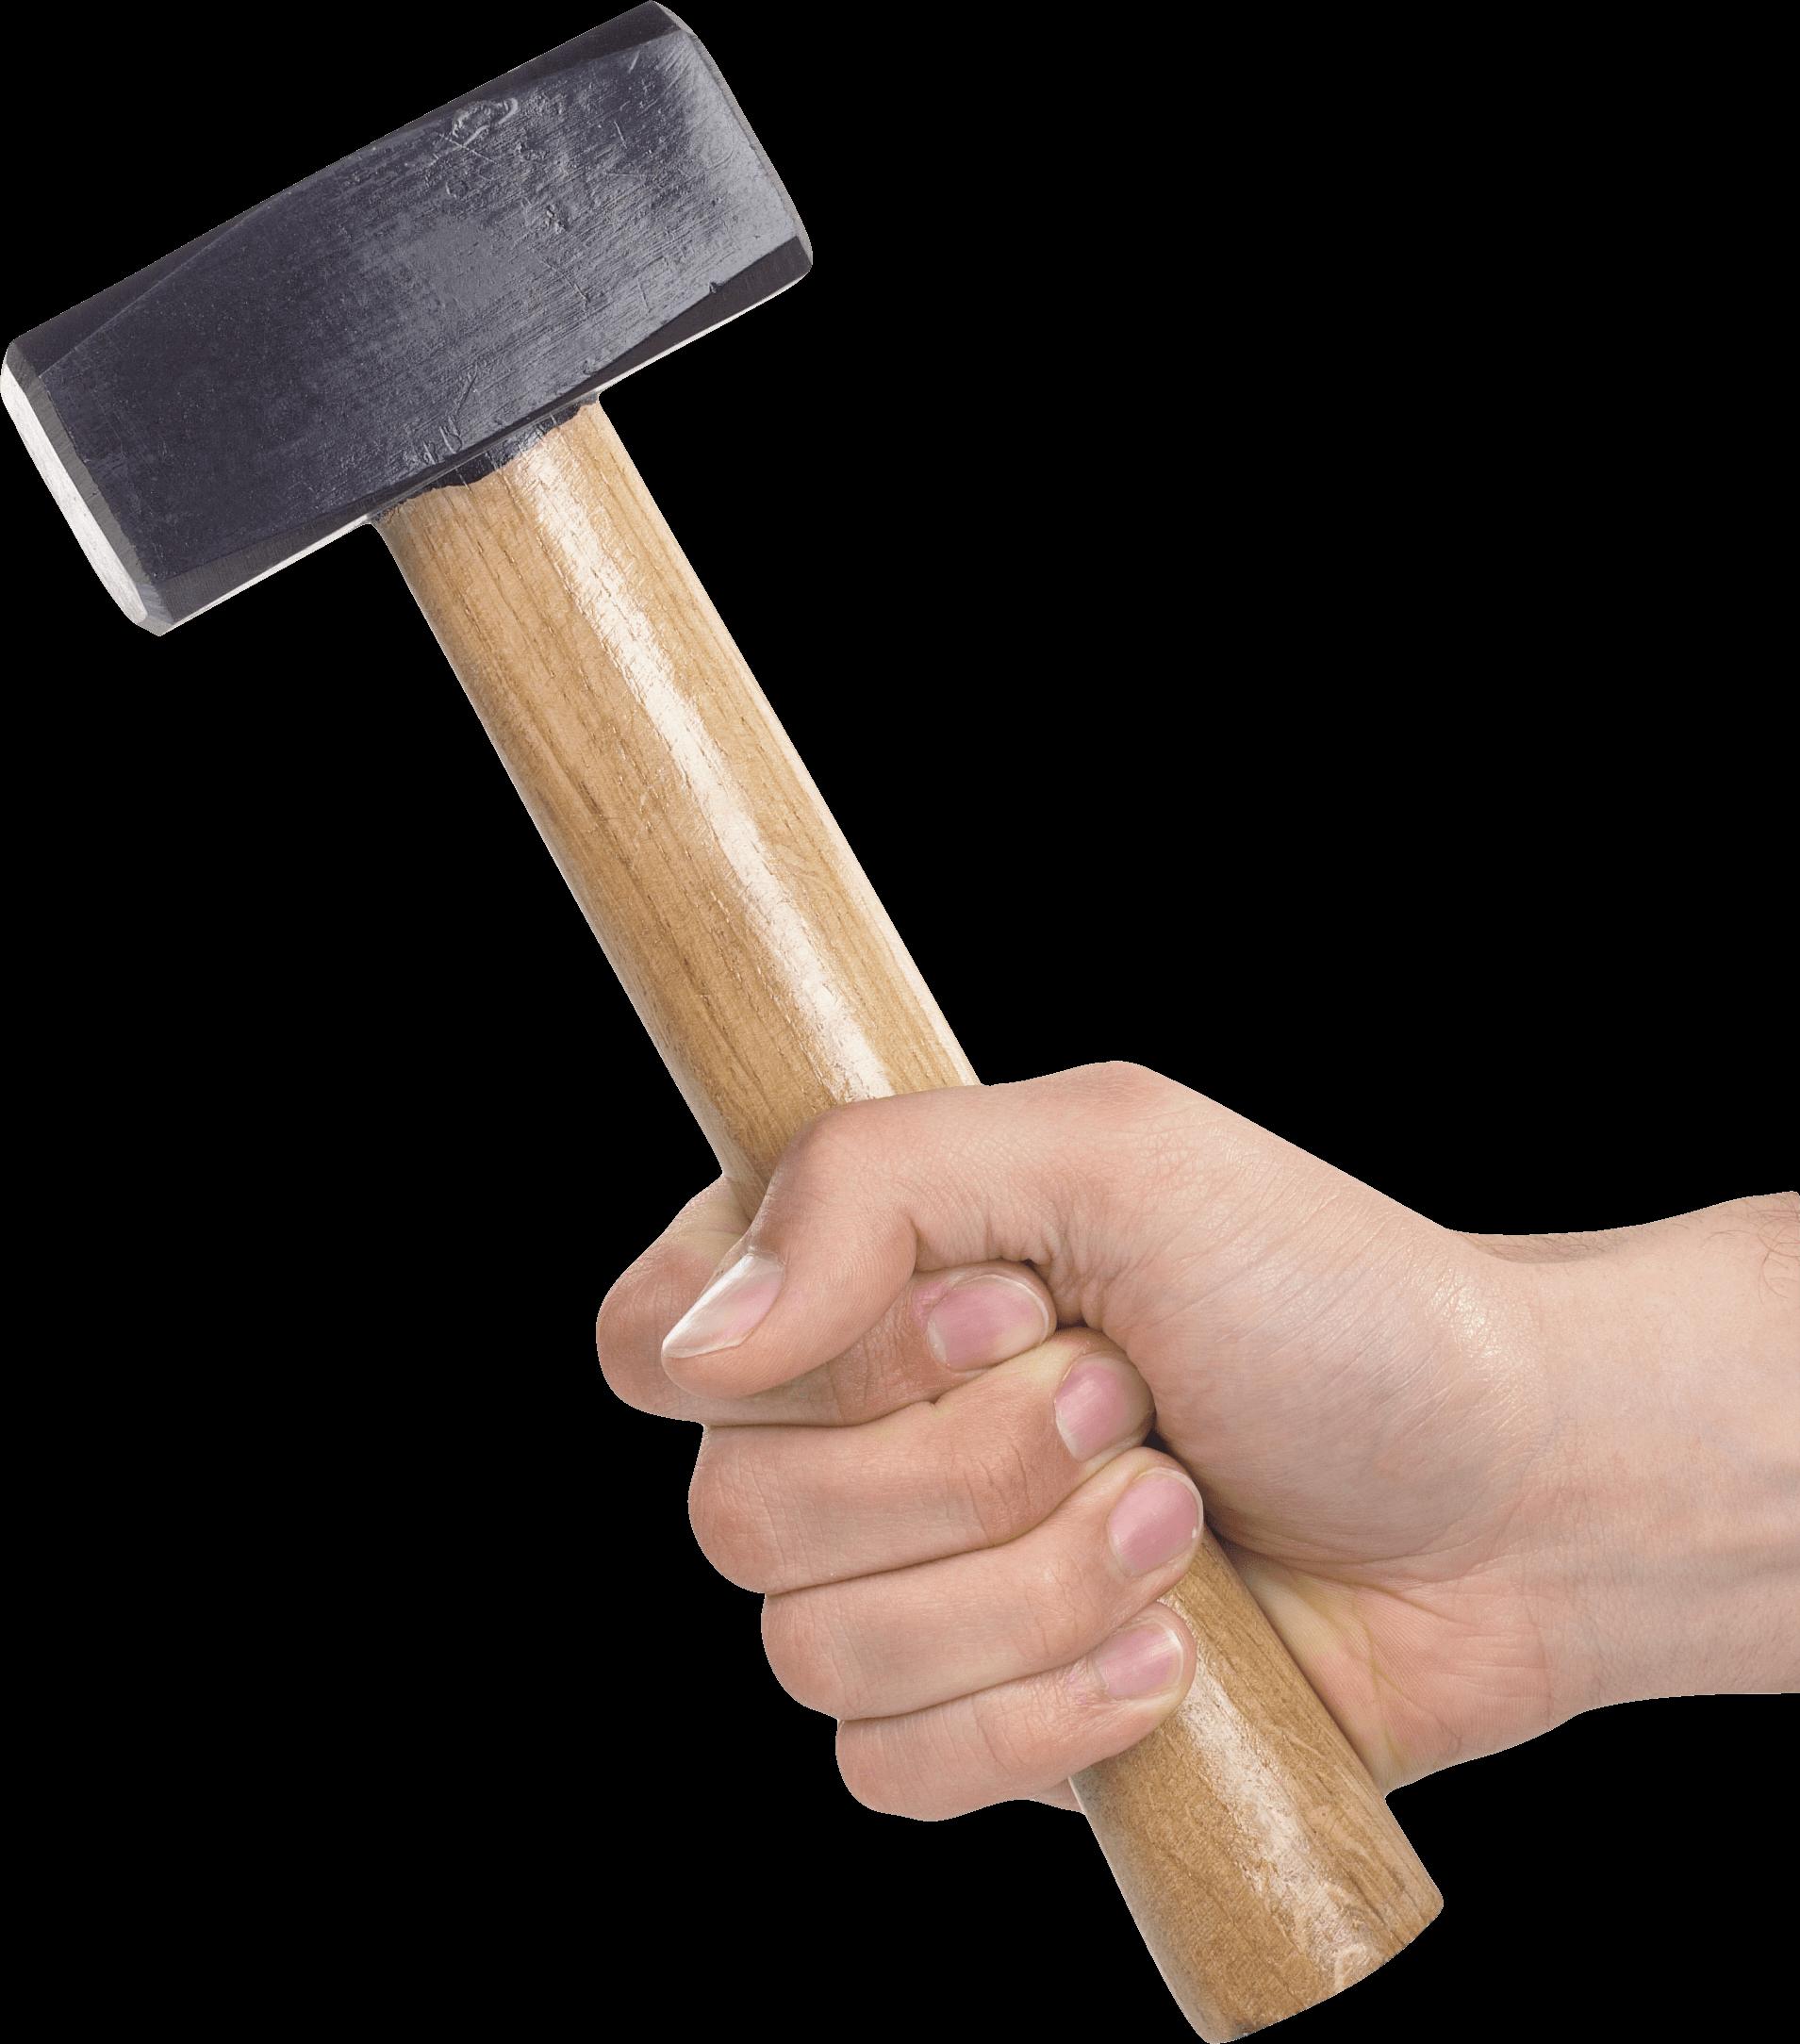 Download Hammer In Hand Png Image Hq Png Image Freepngimg Download okay hand emoji meme   png & gif base. hammer in hand png image hq png image